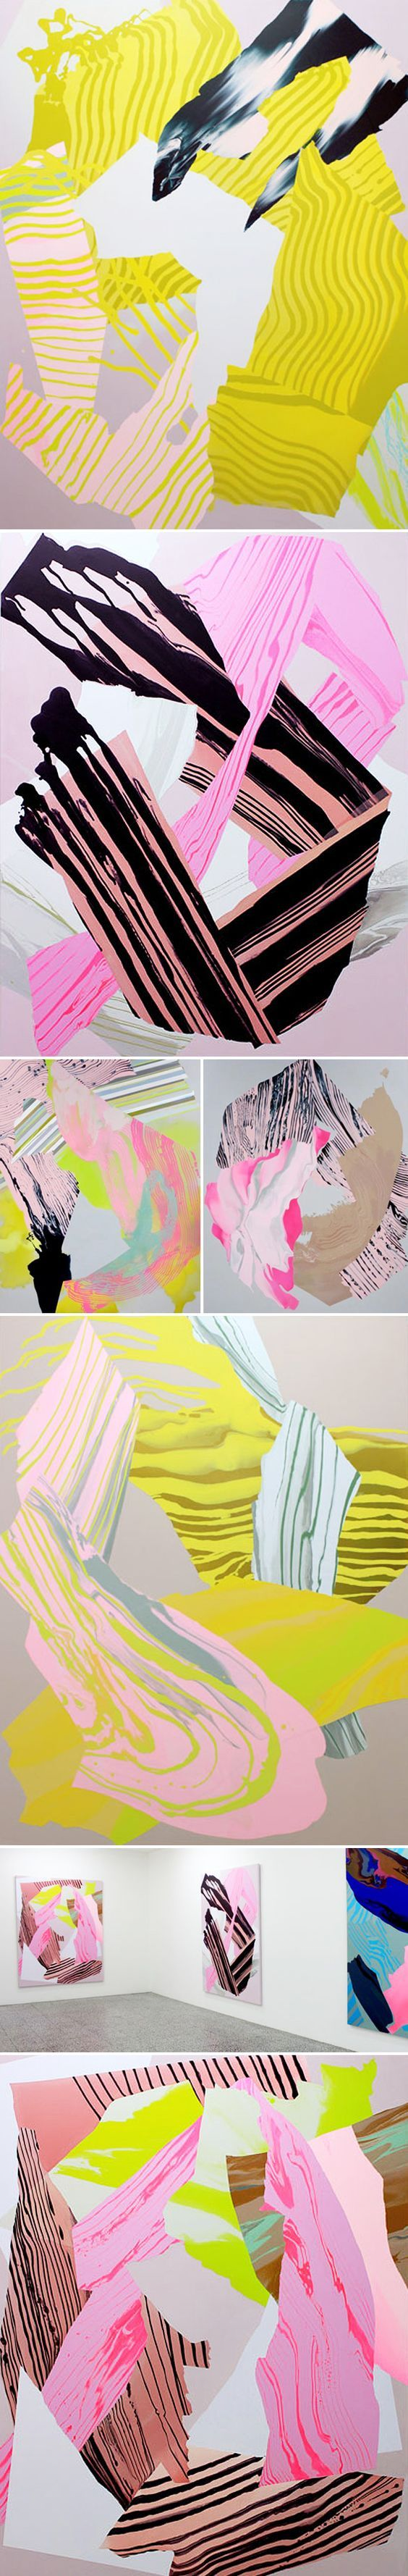 paintings by noël skrzypczak <3: